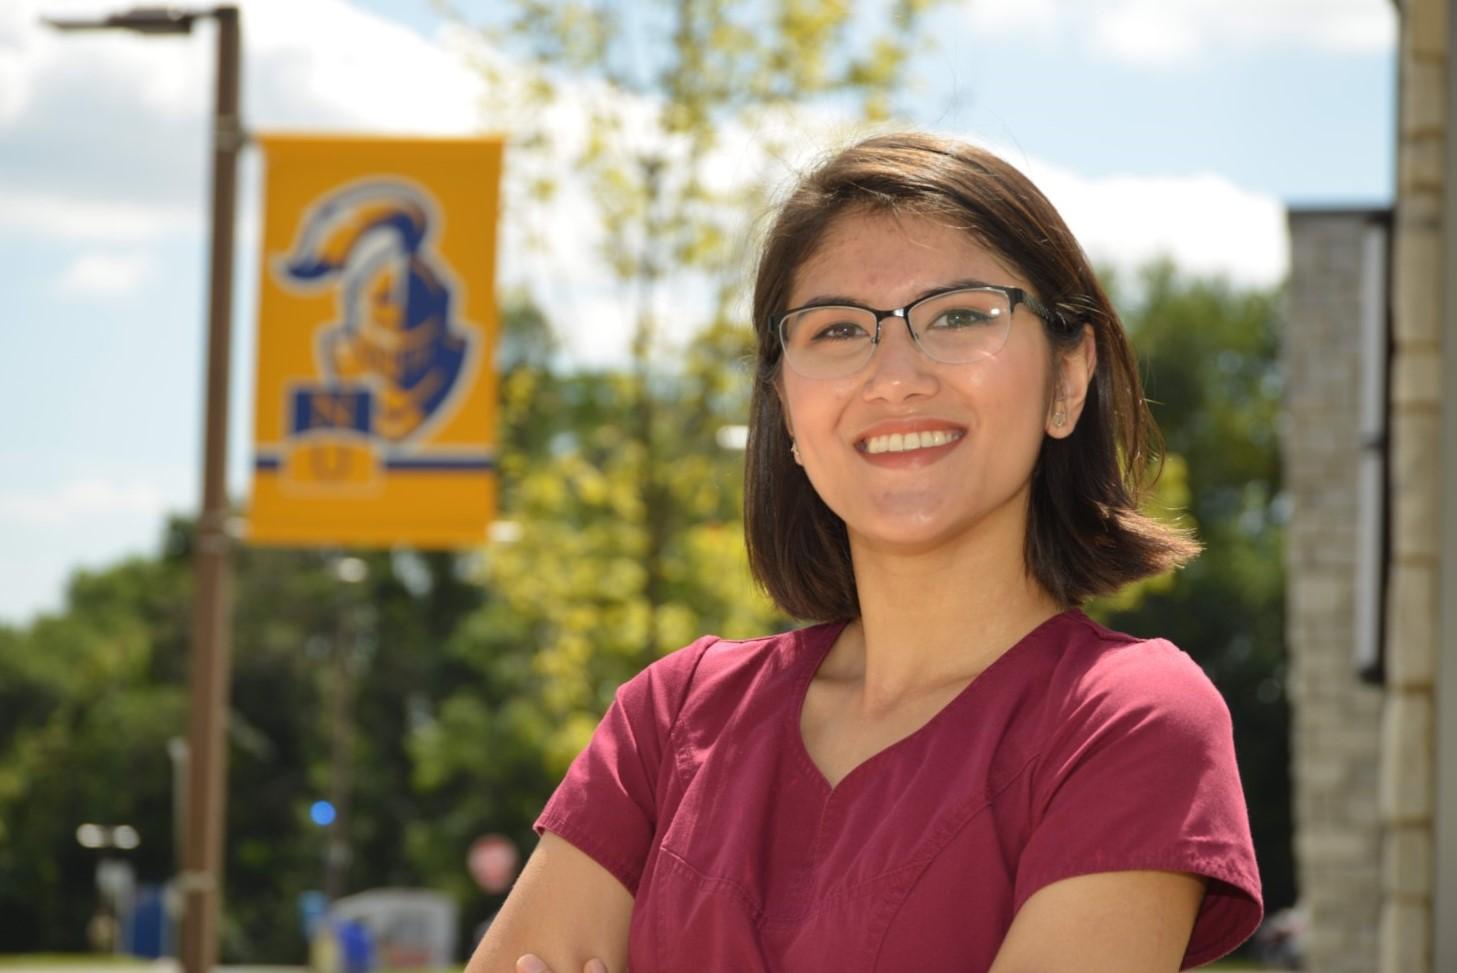 Neumann University Nursing Student from Folcroft Named Psychiatric Scholar